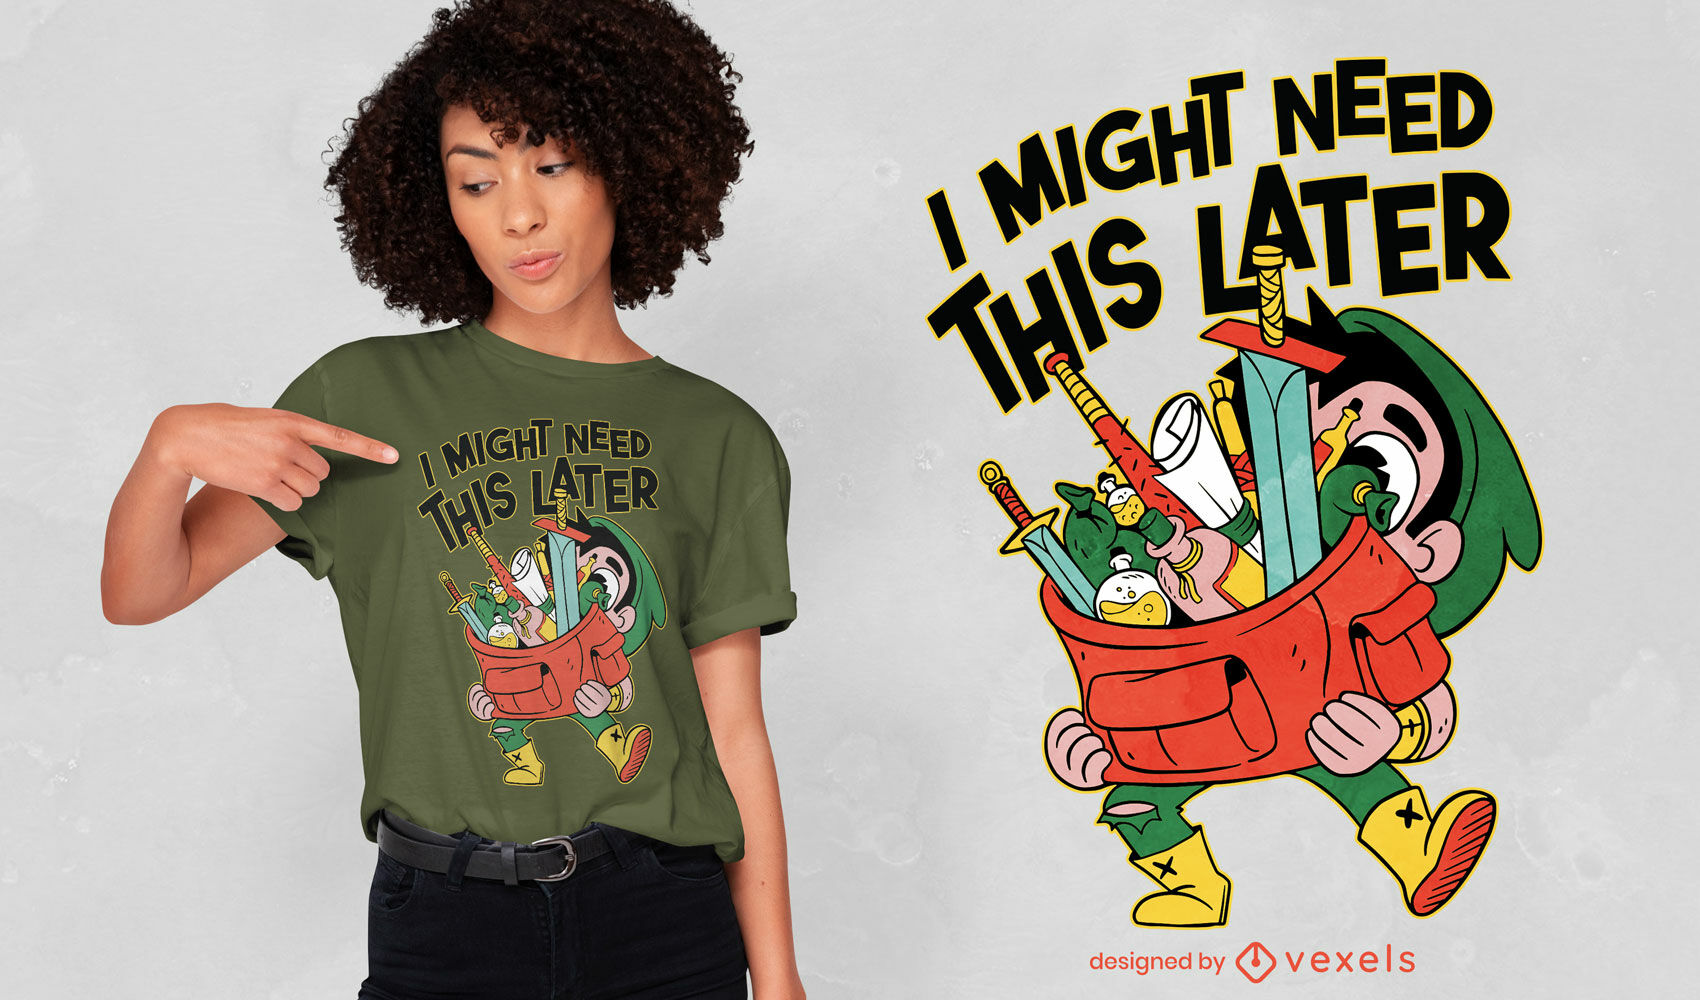 RPG Player items t-shirt design